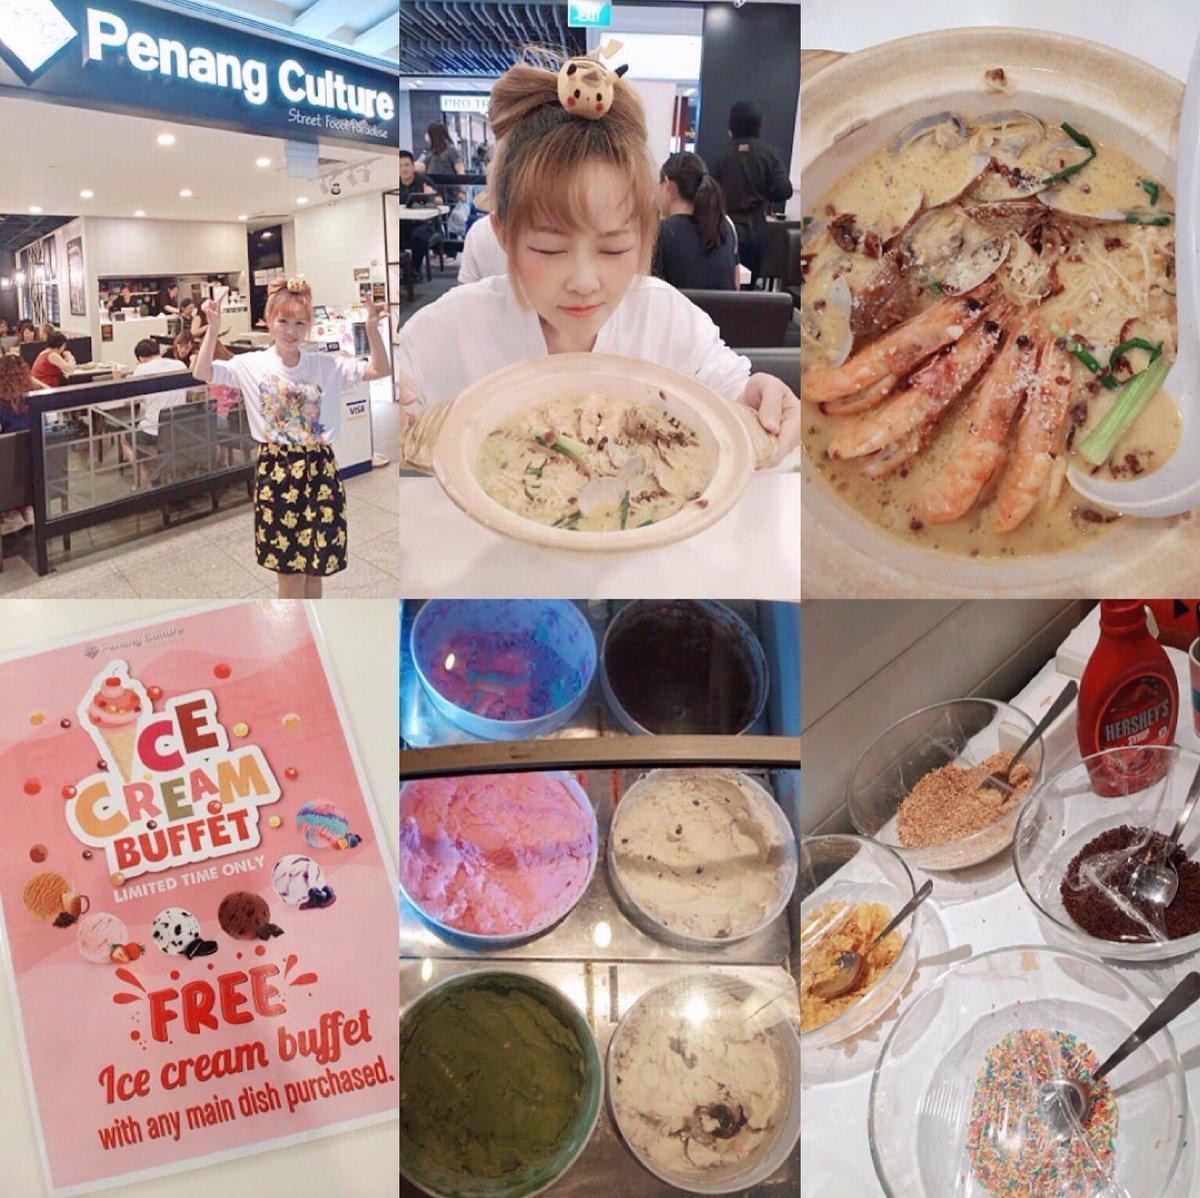 https://instagram.com/p/B-LiLMogp7d/ #bloggersg #ootdsg #sgblog #blogsg #blogger #contentcreator #globalcreator #sgphotography #foodporn #foodie #foodiesg #sgfoodporn #sgfoodlover #sgfoodblogger #pikachu #pokemonpic.twitter.com/41TnTxEBrC